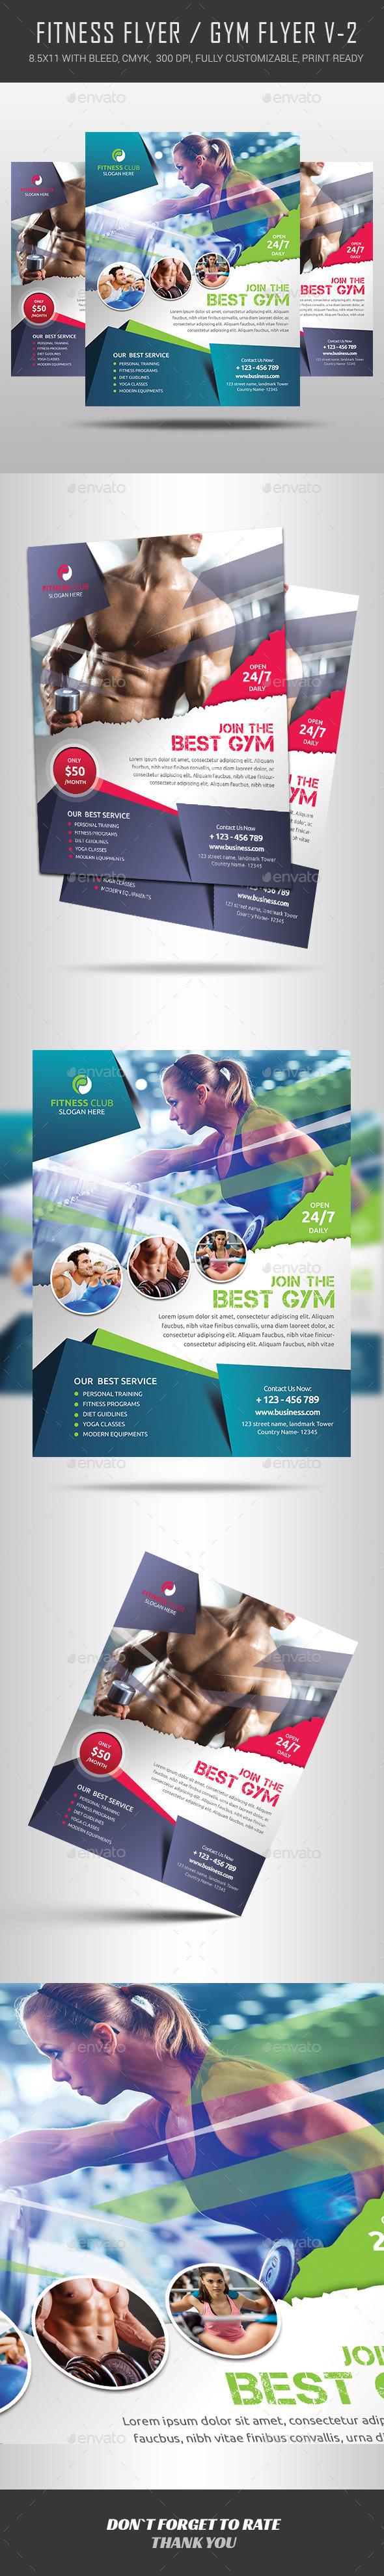 edit fitness flyer gym flyer on behance flyer pinterest gym